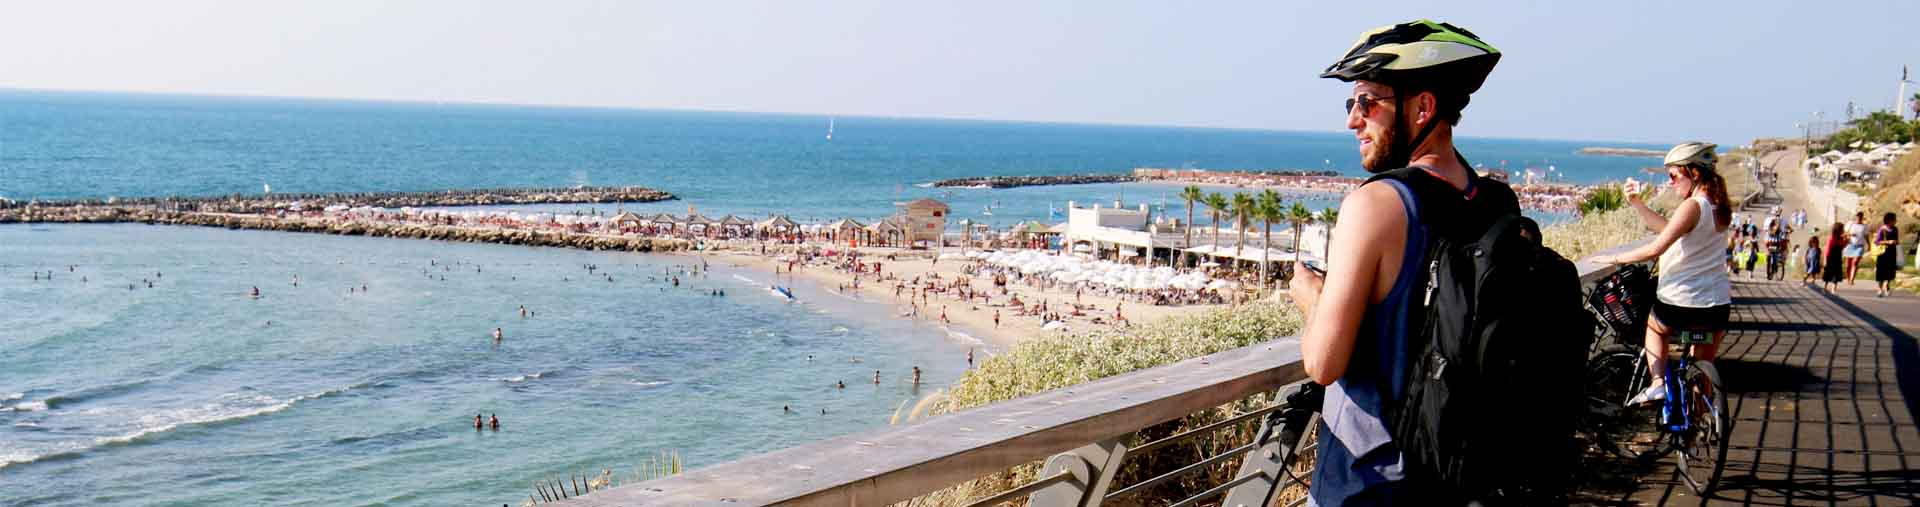 the beach of tel aviv